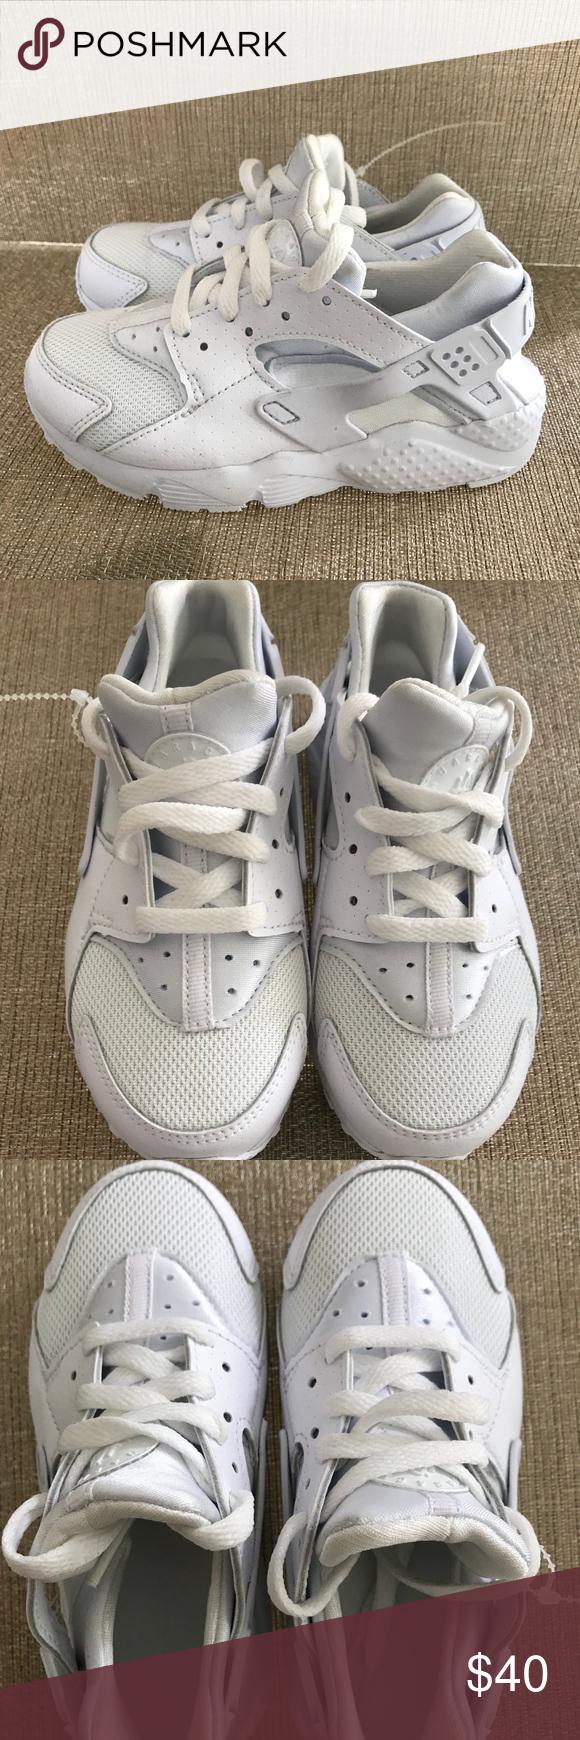 Kids Nike Huarache Sizes toddler 11, 12